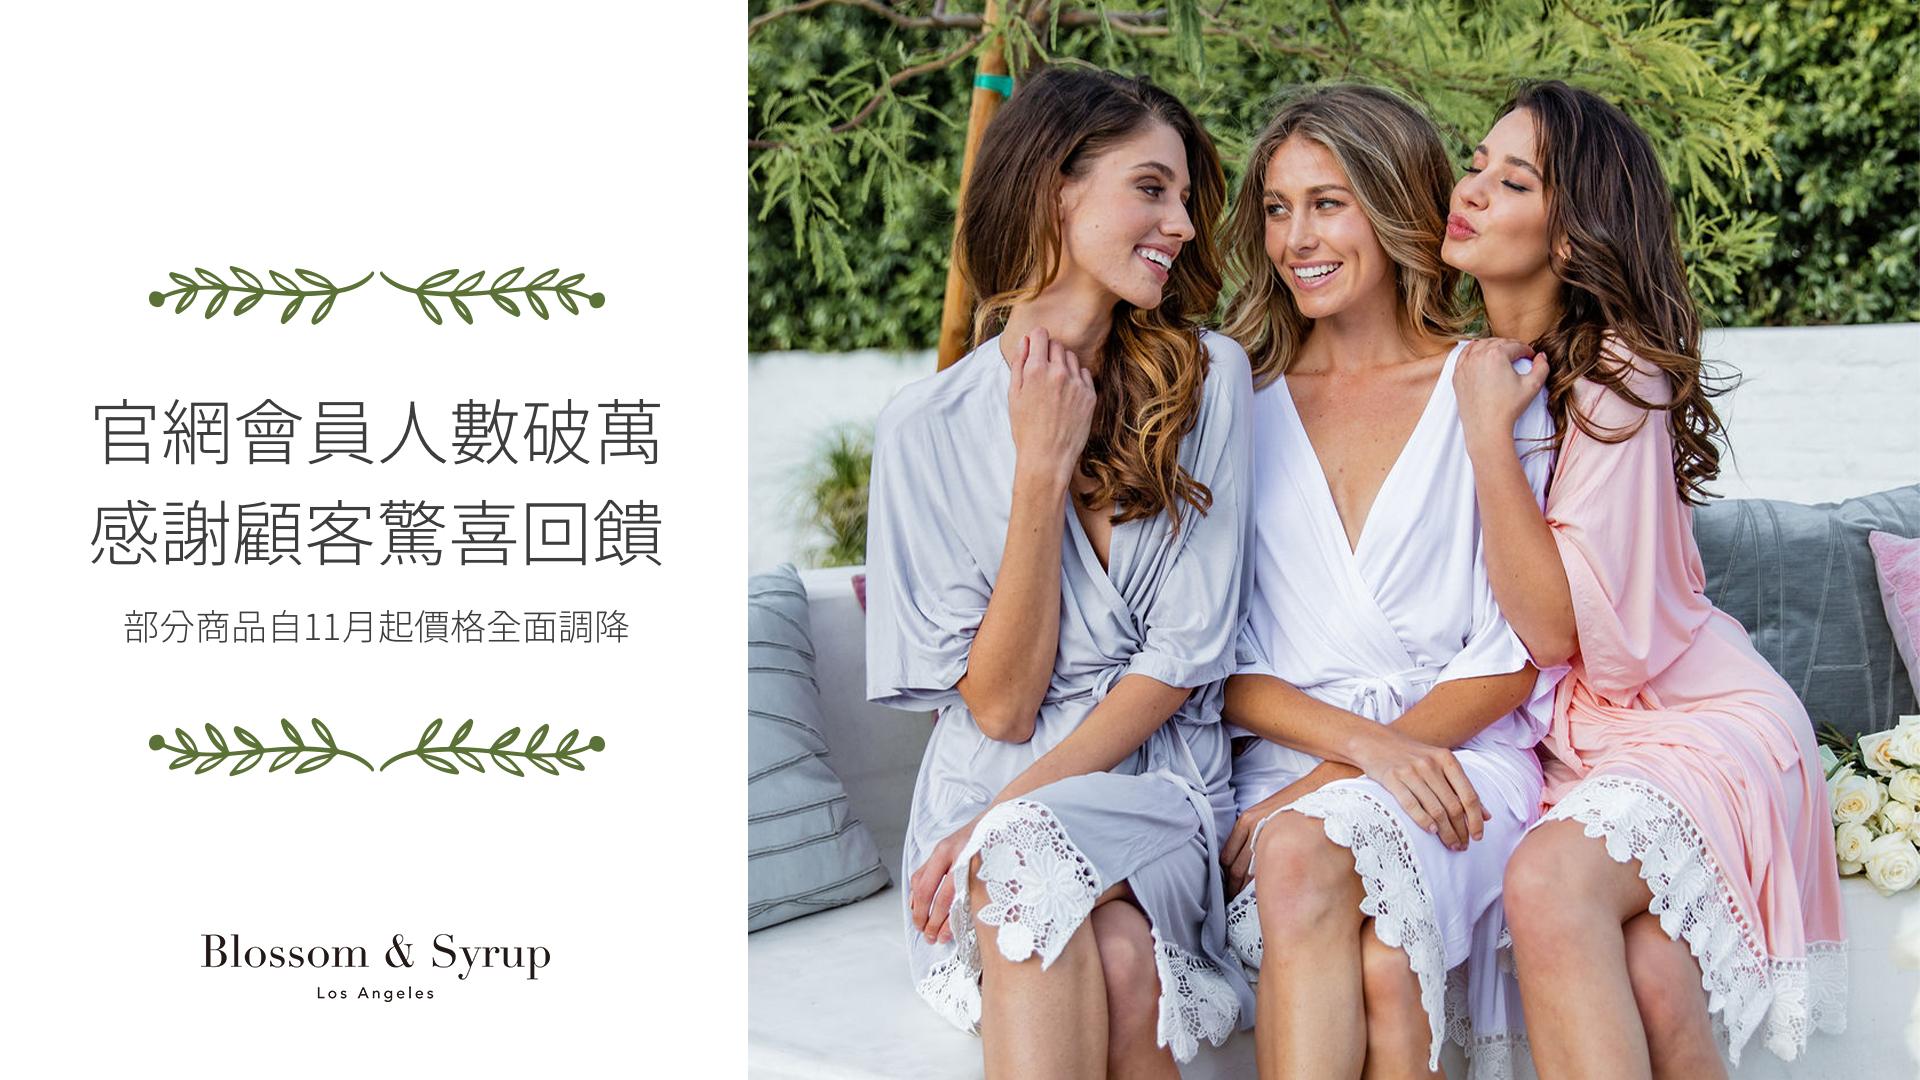 Blossom & Syrup Asia |